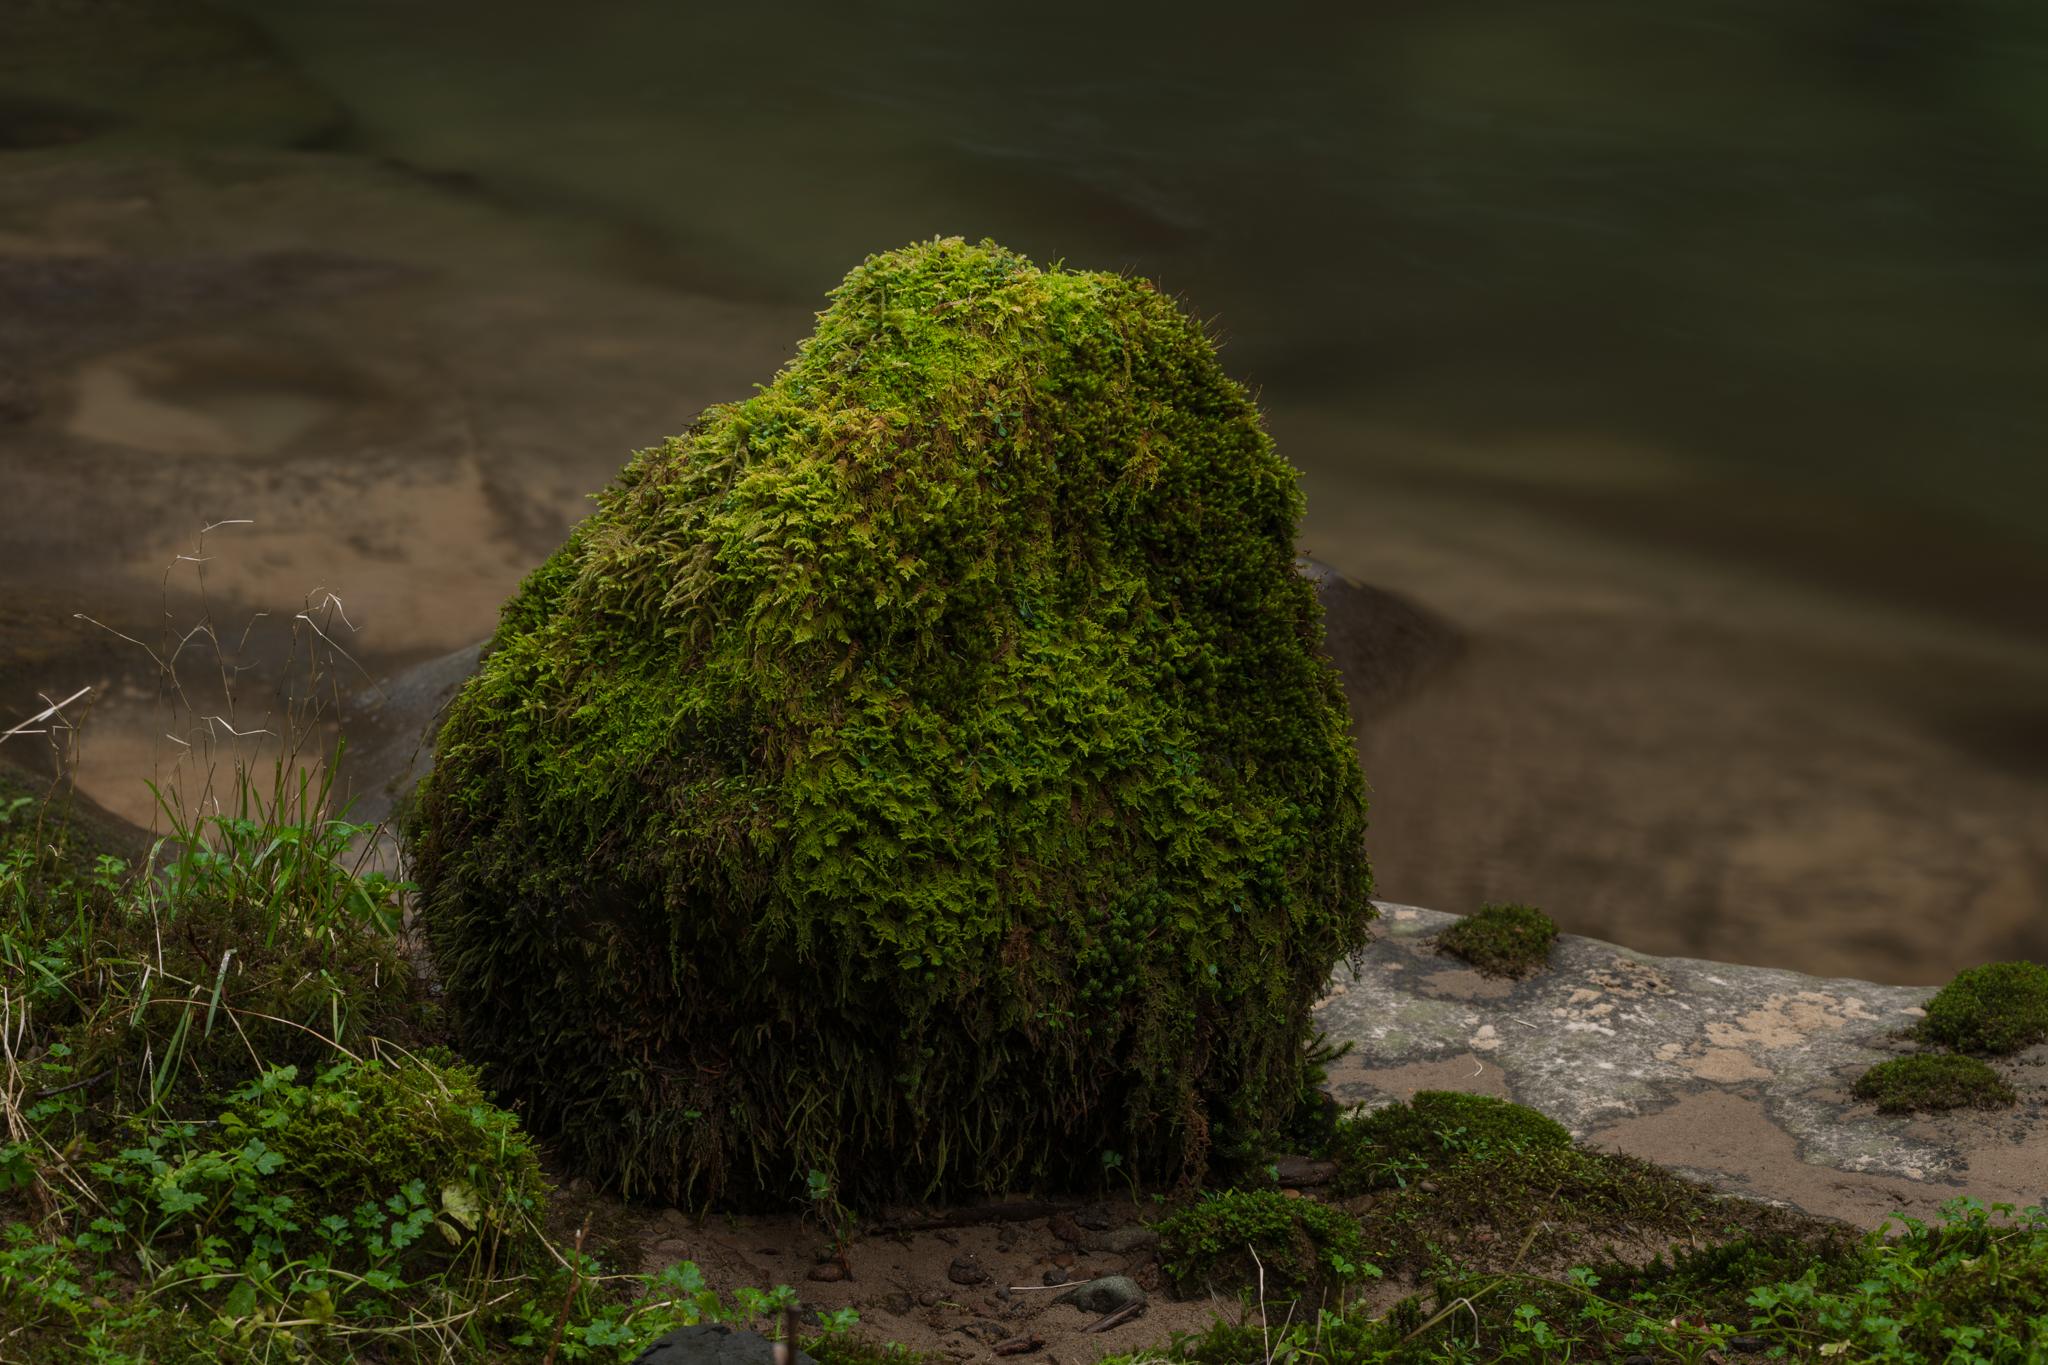 Wallpaper Stone River Moss Green Plants Nature Outdoor